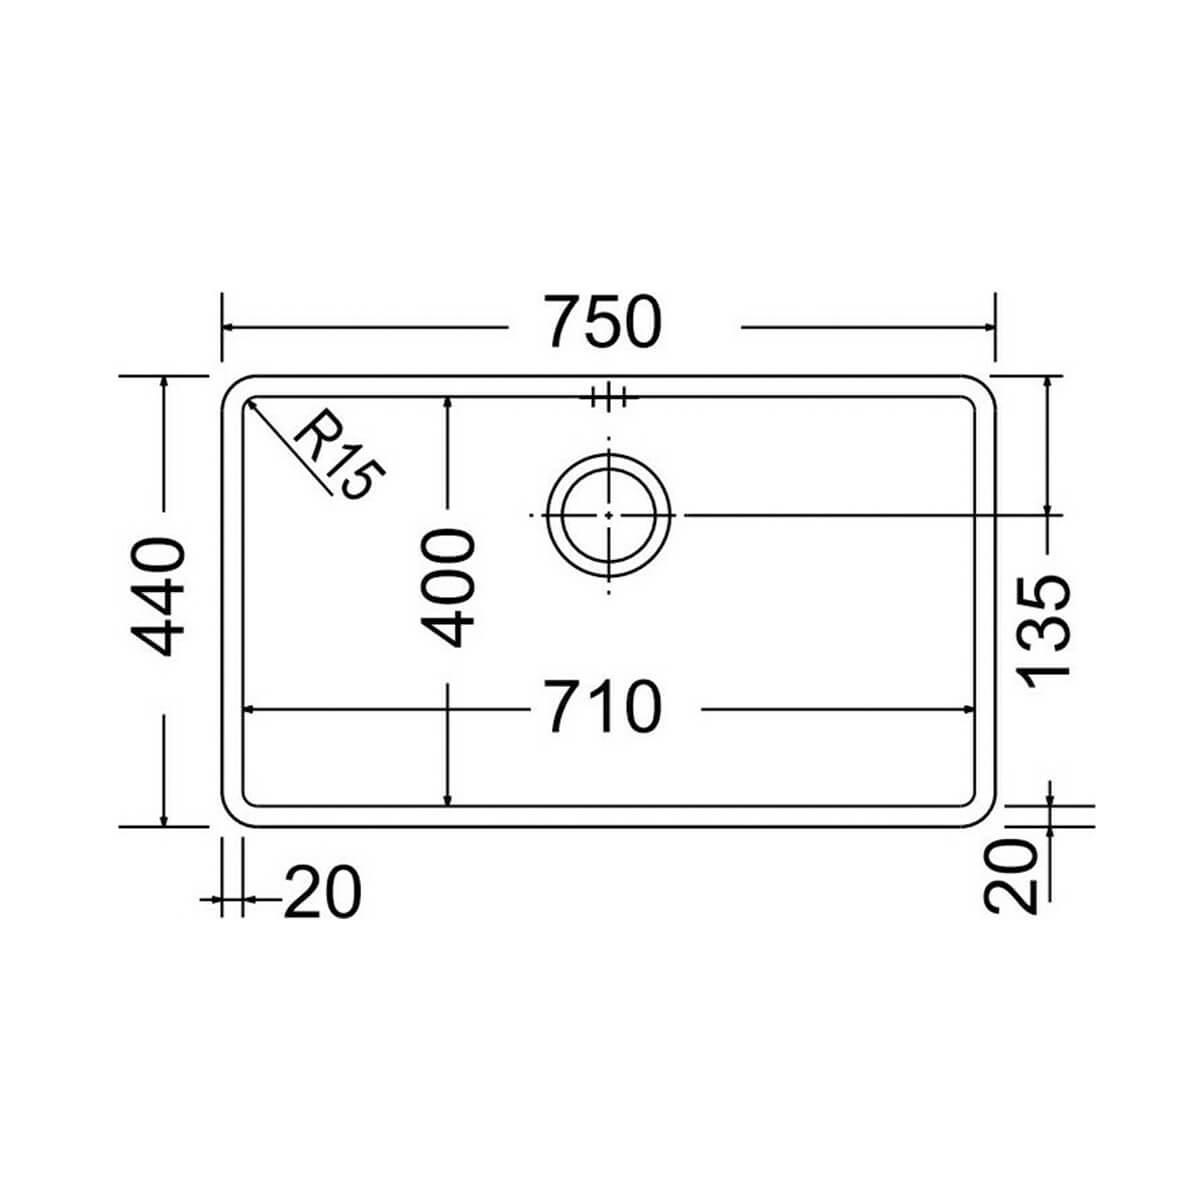 APELL ΥΠΟΚΑΘΗΜΕΝΟΣ ΝΕΡΟΧΥΤΗΣ METAMORFOSIS MEM71-410 PVD ΜΑΥΡΟ (75x44) 3